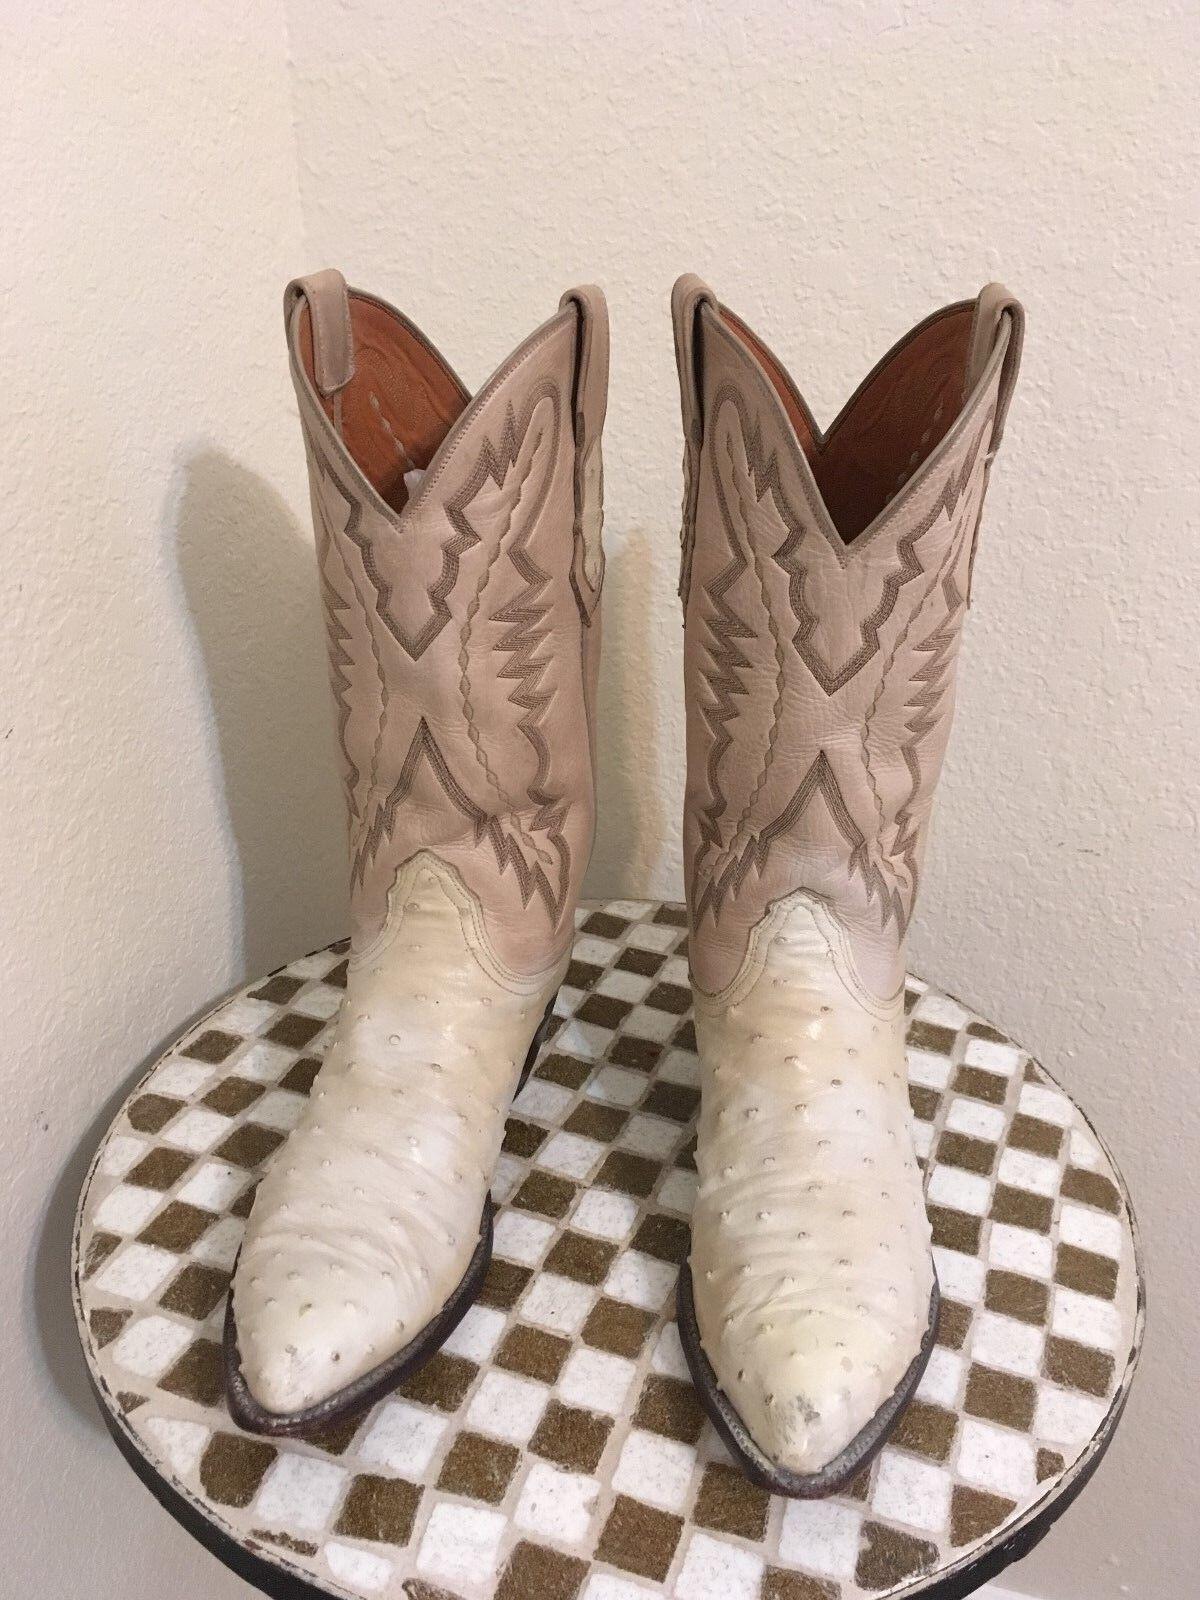 blancoo marfil hueso envejecido LUCCHESE OSTRICH Occidental botas De Vaquero 8.5 D